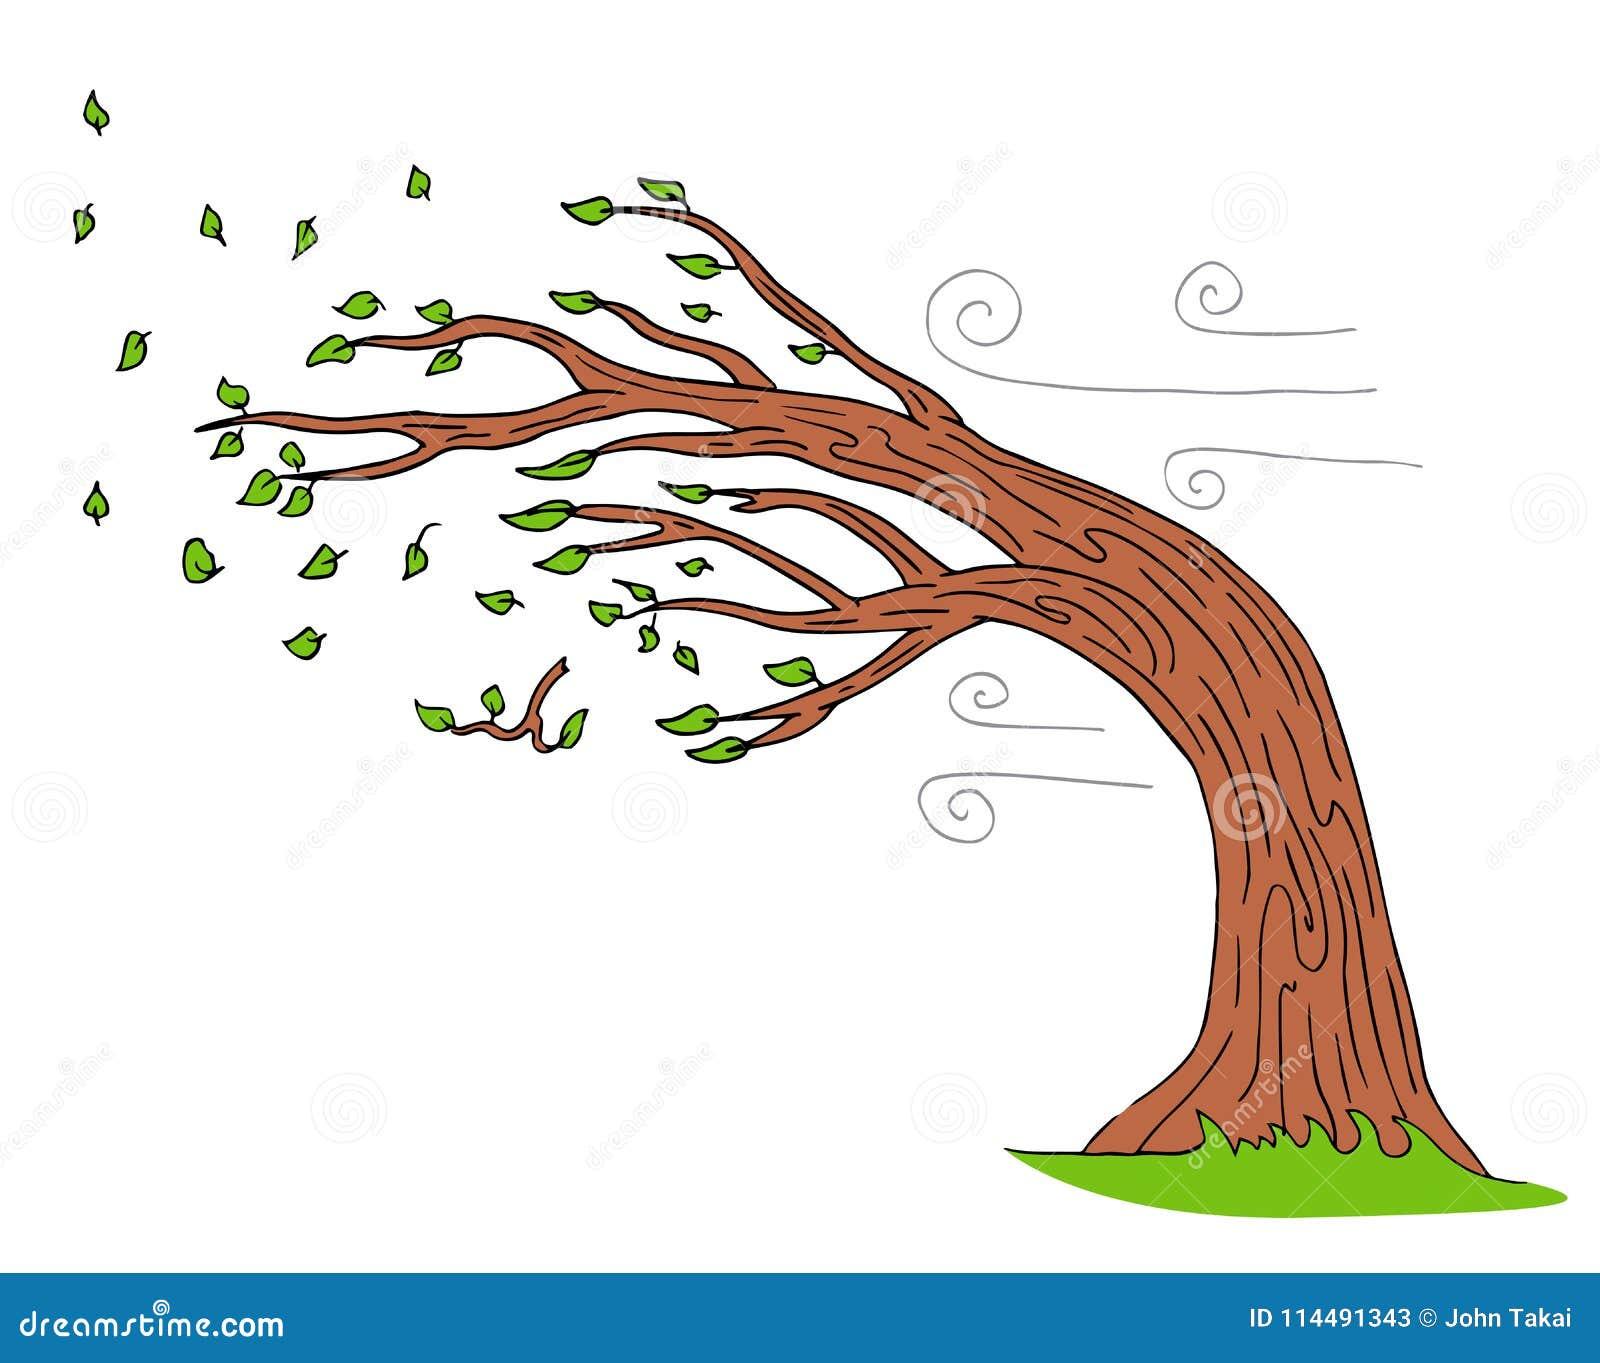 Blowing Wind Windy Day Bending Tree